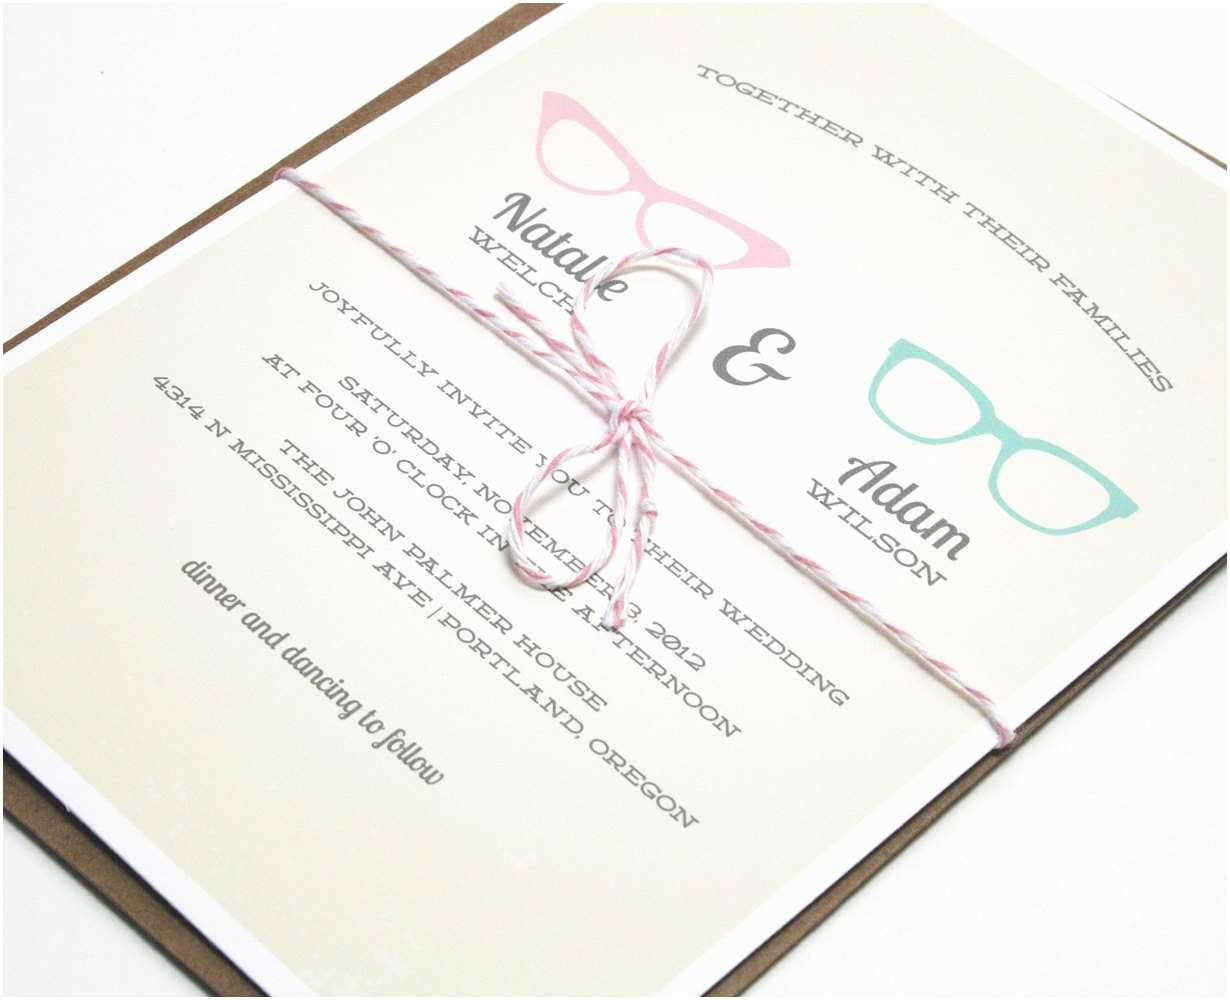 Nerdy Wedding Invitations Nerdy Wedding Invites to Shop now — Cool Geek Wedding